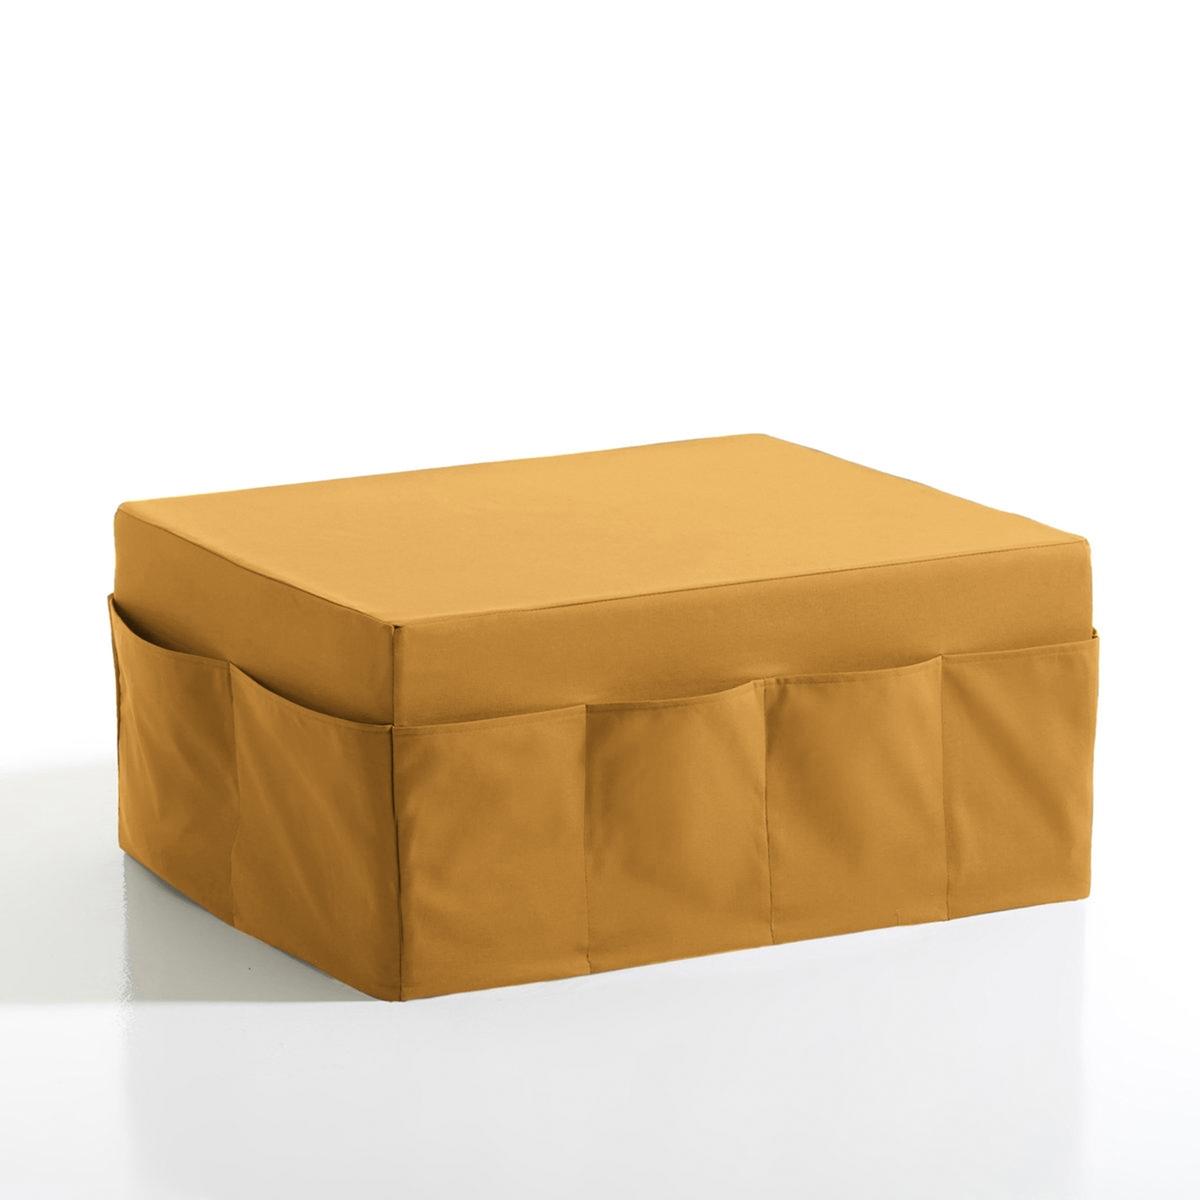 Банкетка-пуф LaRedoute Со съемным чехлом Meeting единый размер желтый банкетки